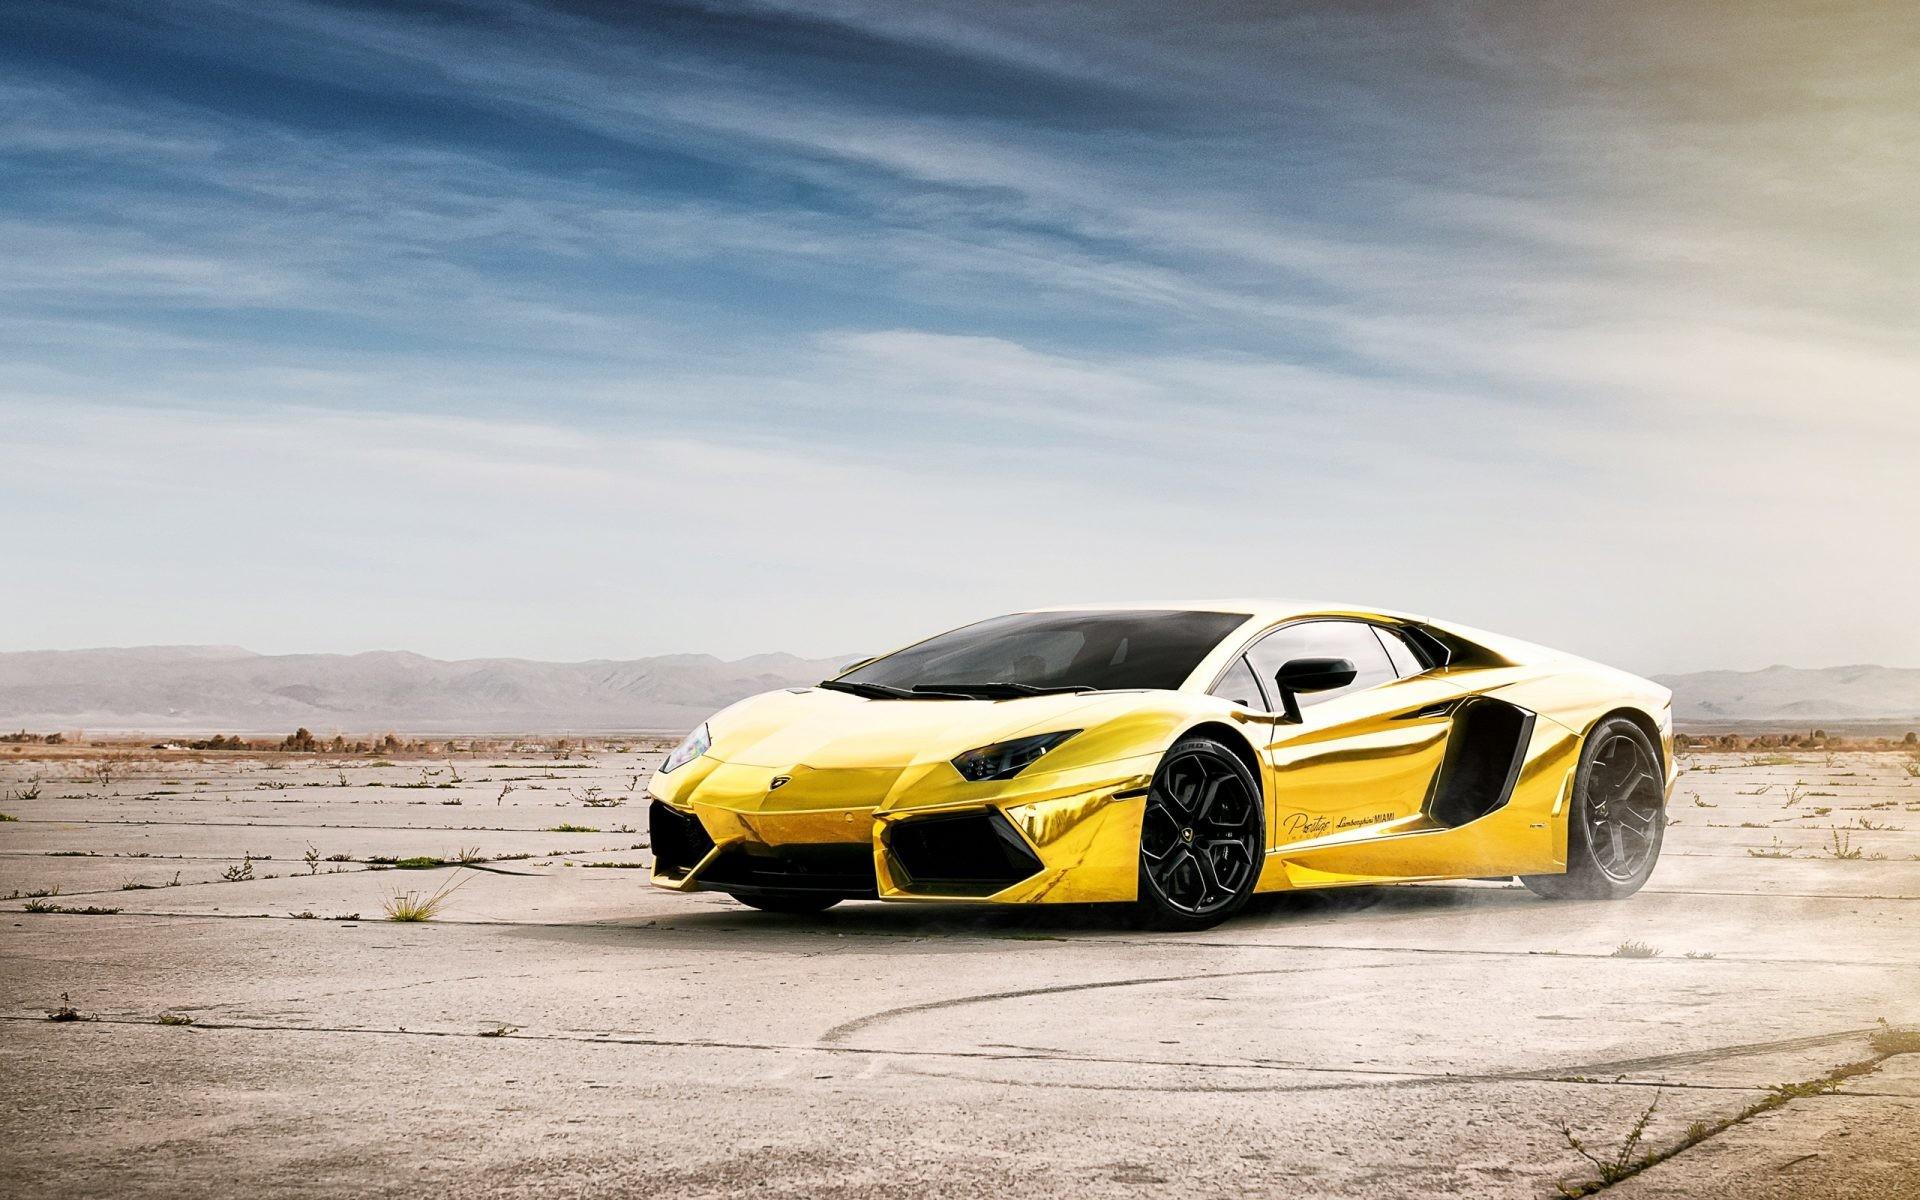 Lamborghini Aventador LP700-4 gold color 4k Wallpaper